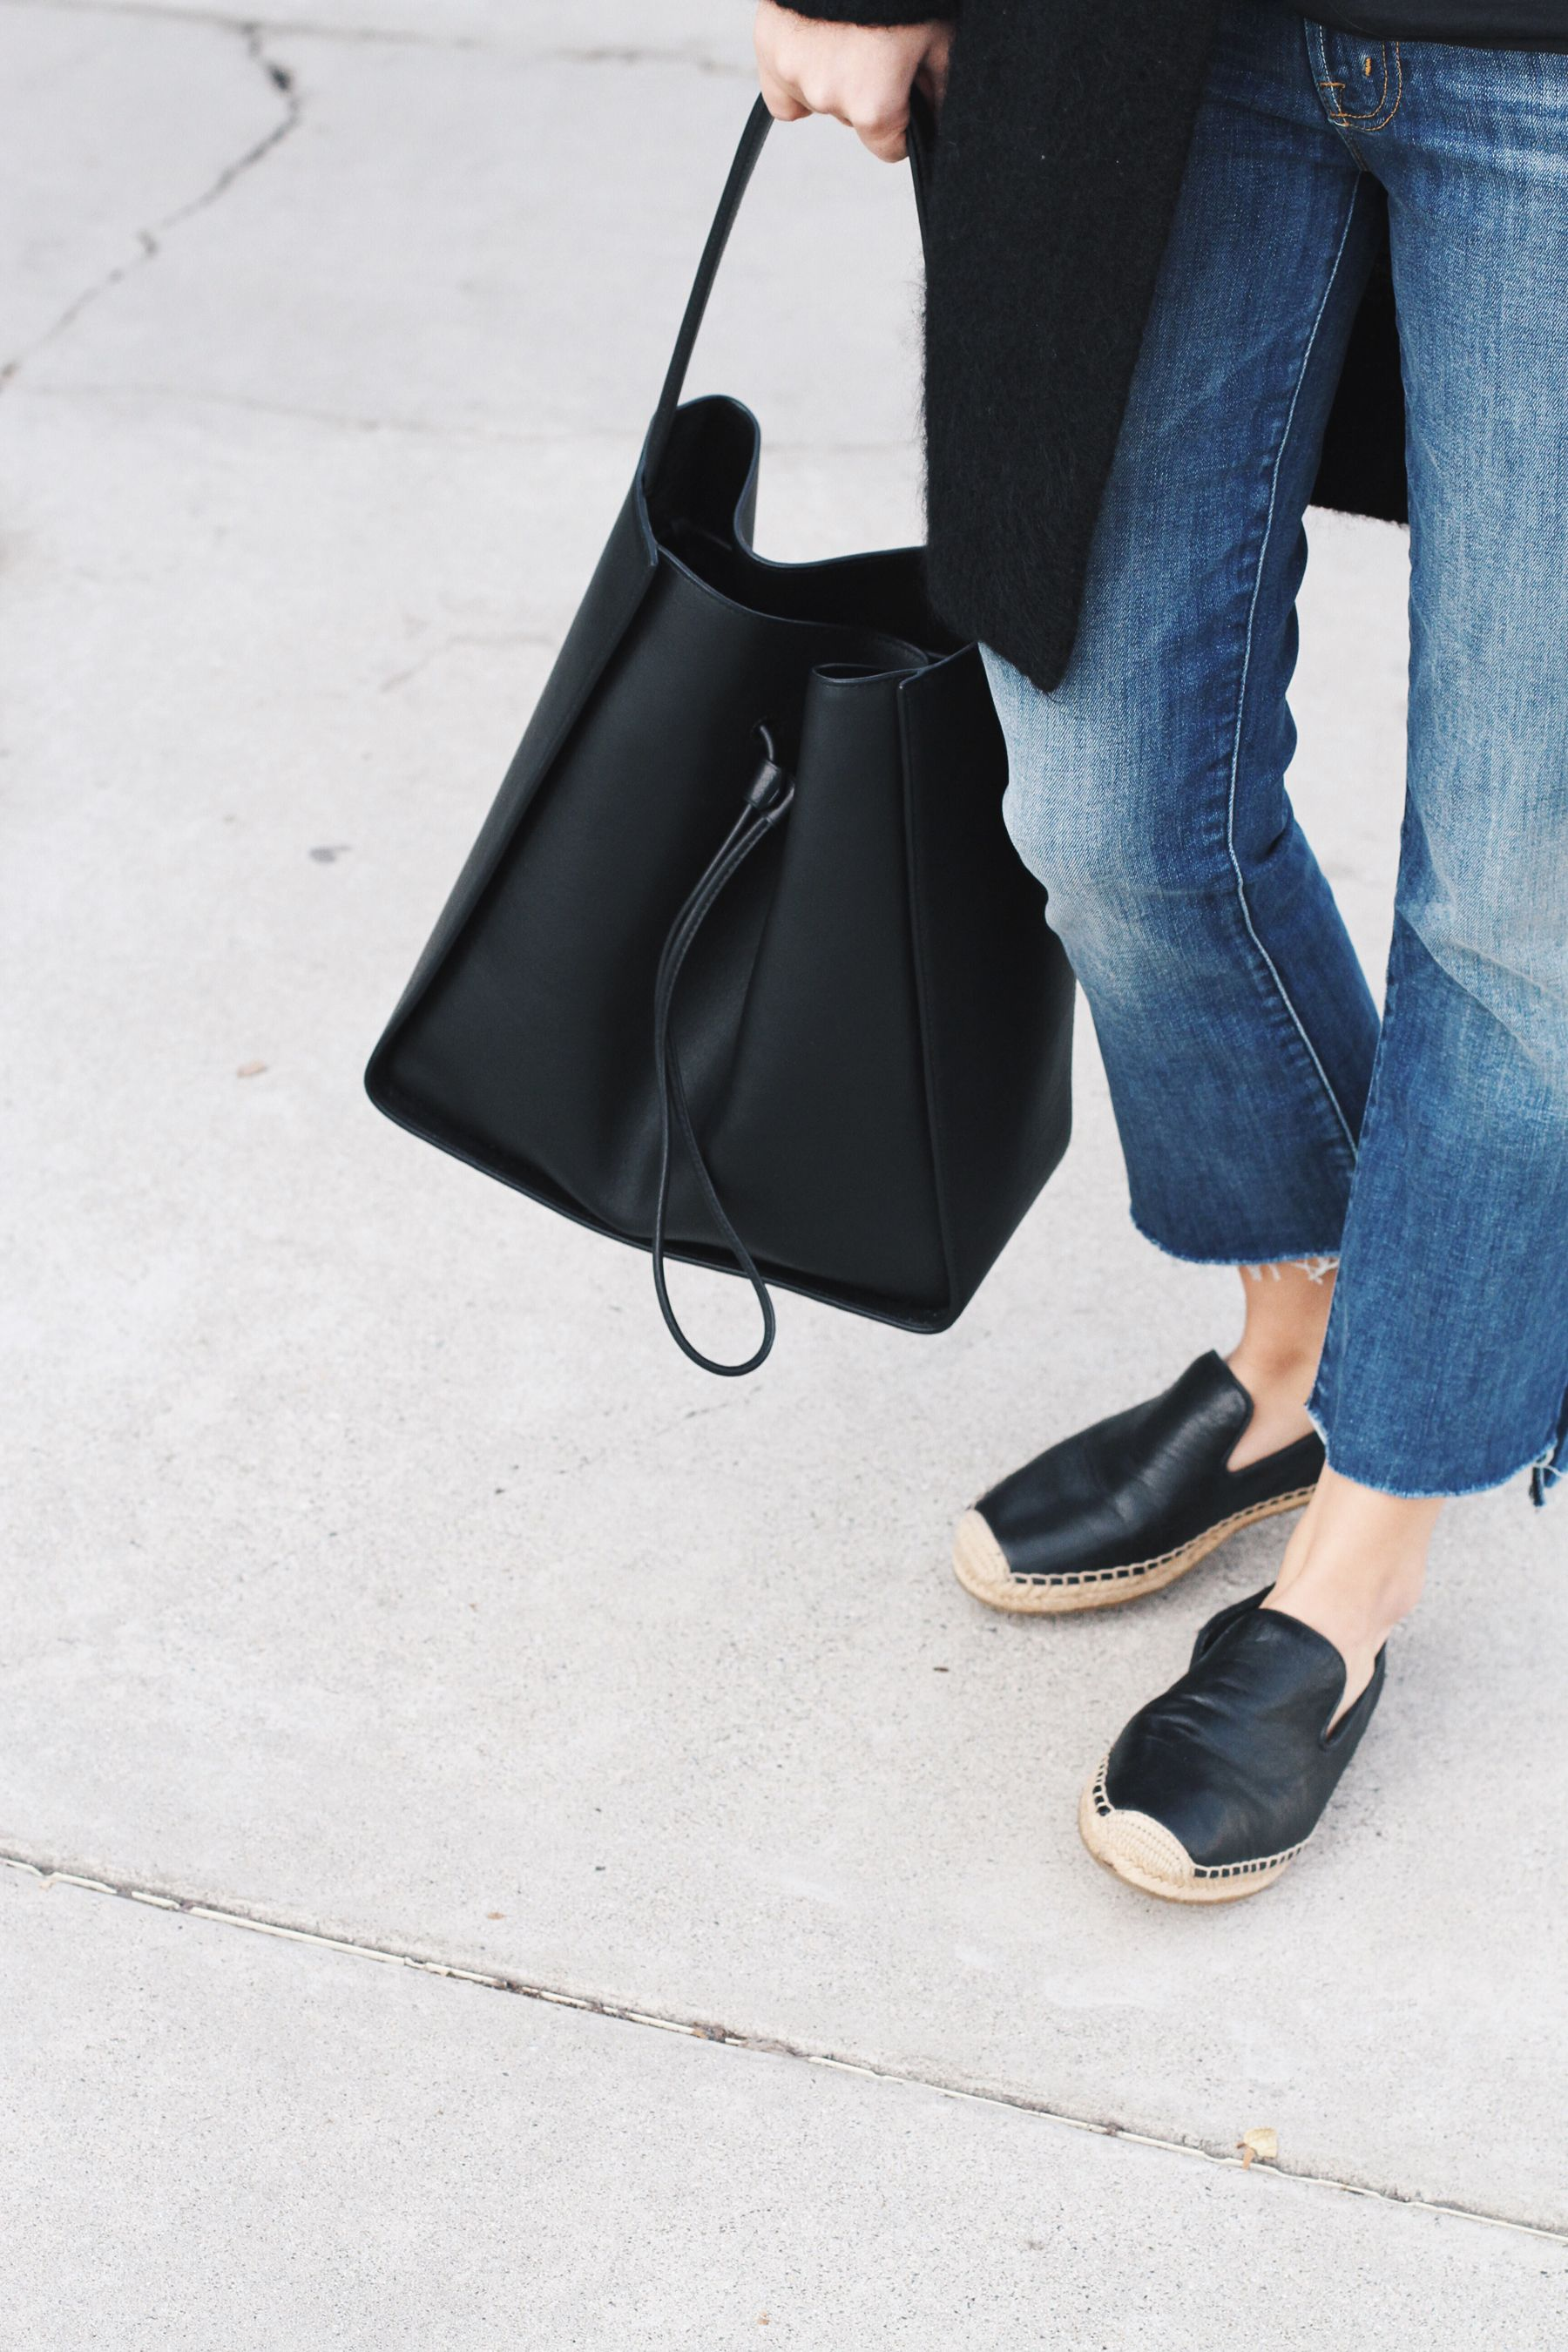 Mother Denim jeans, 3.1 Phillip Lim bucket bag & Acne Studios cardigan. Via Mija